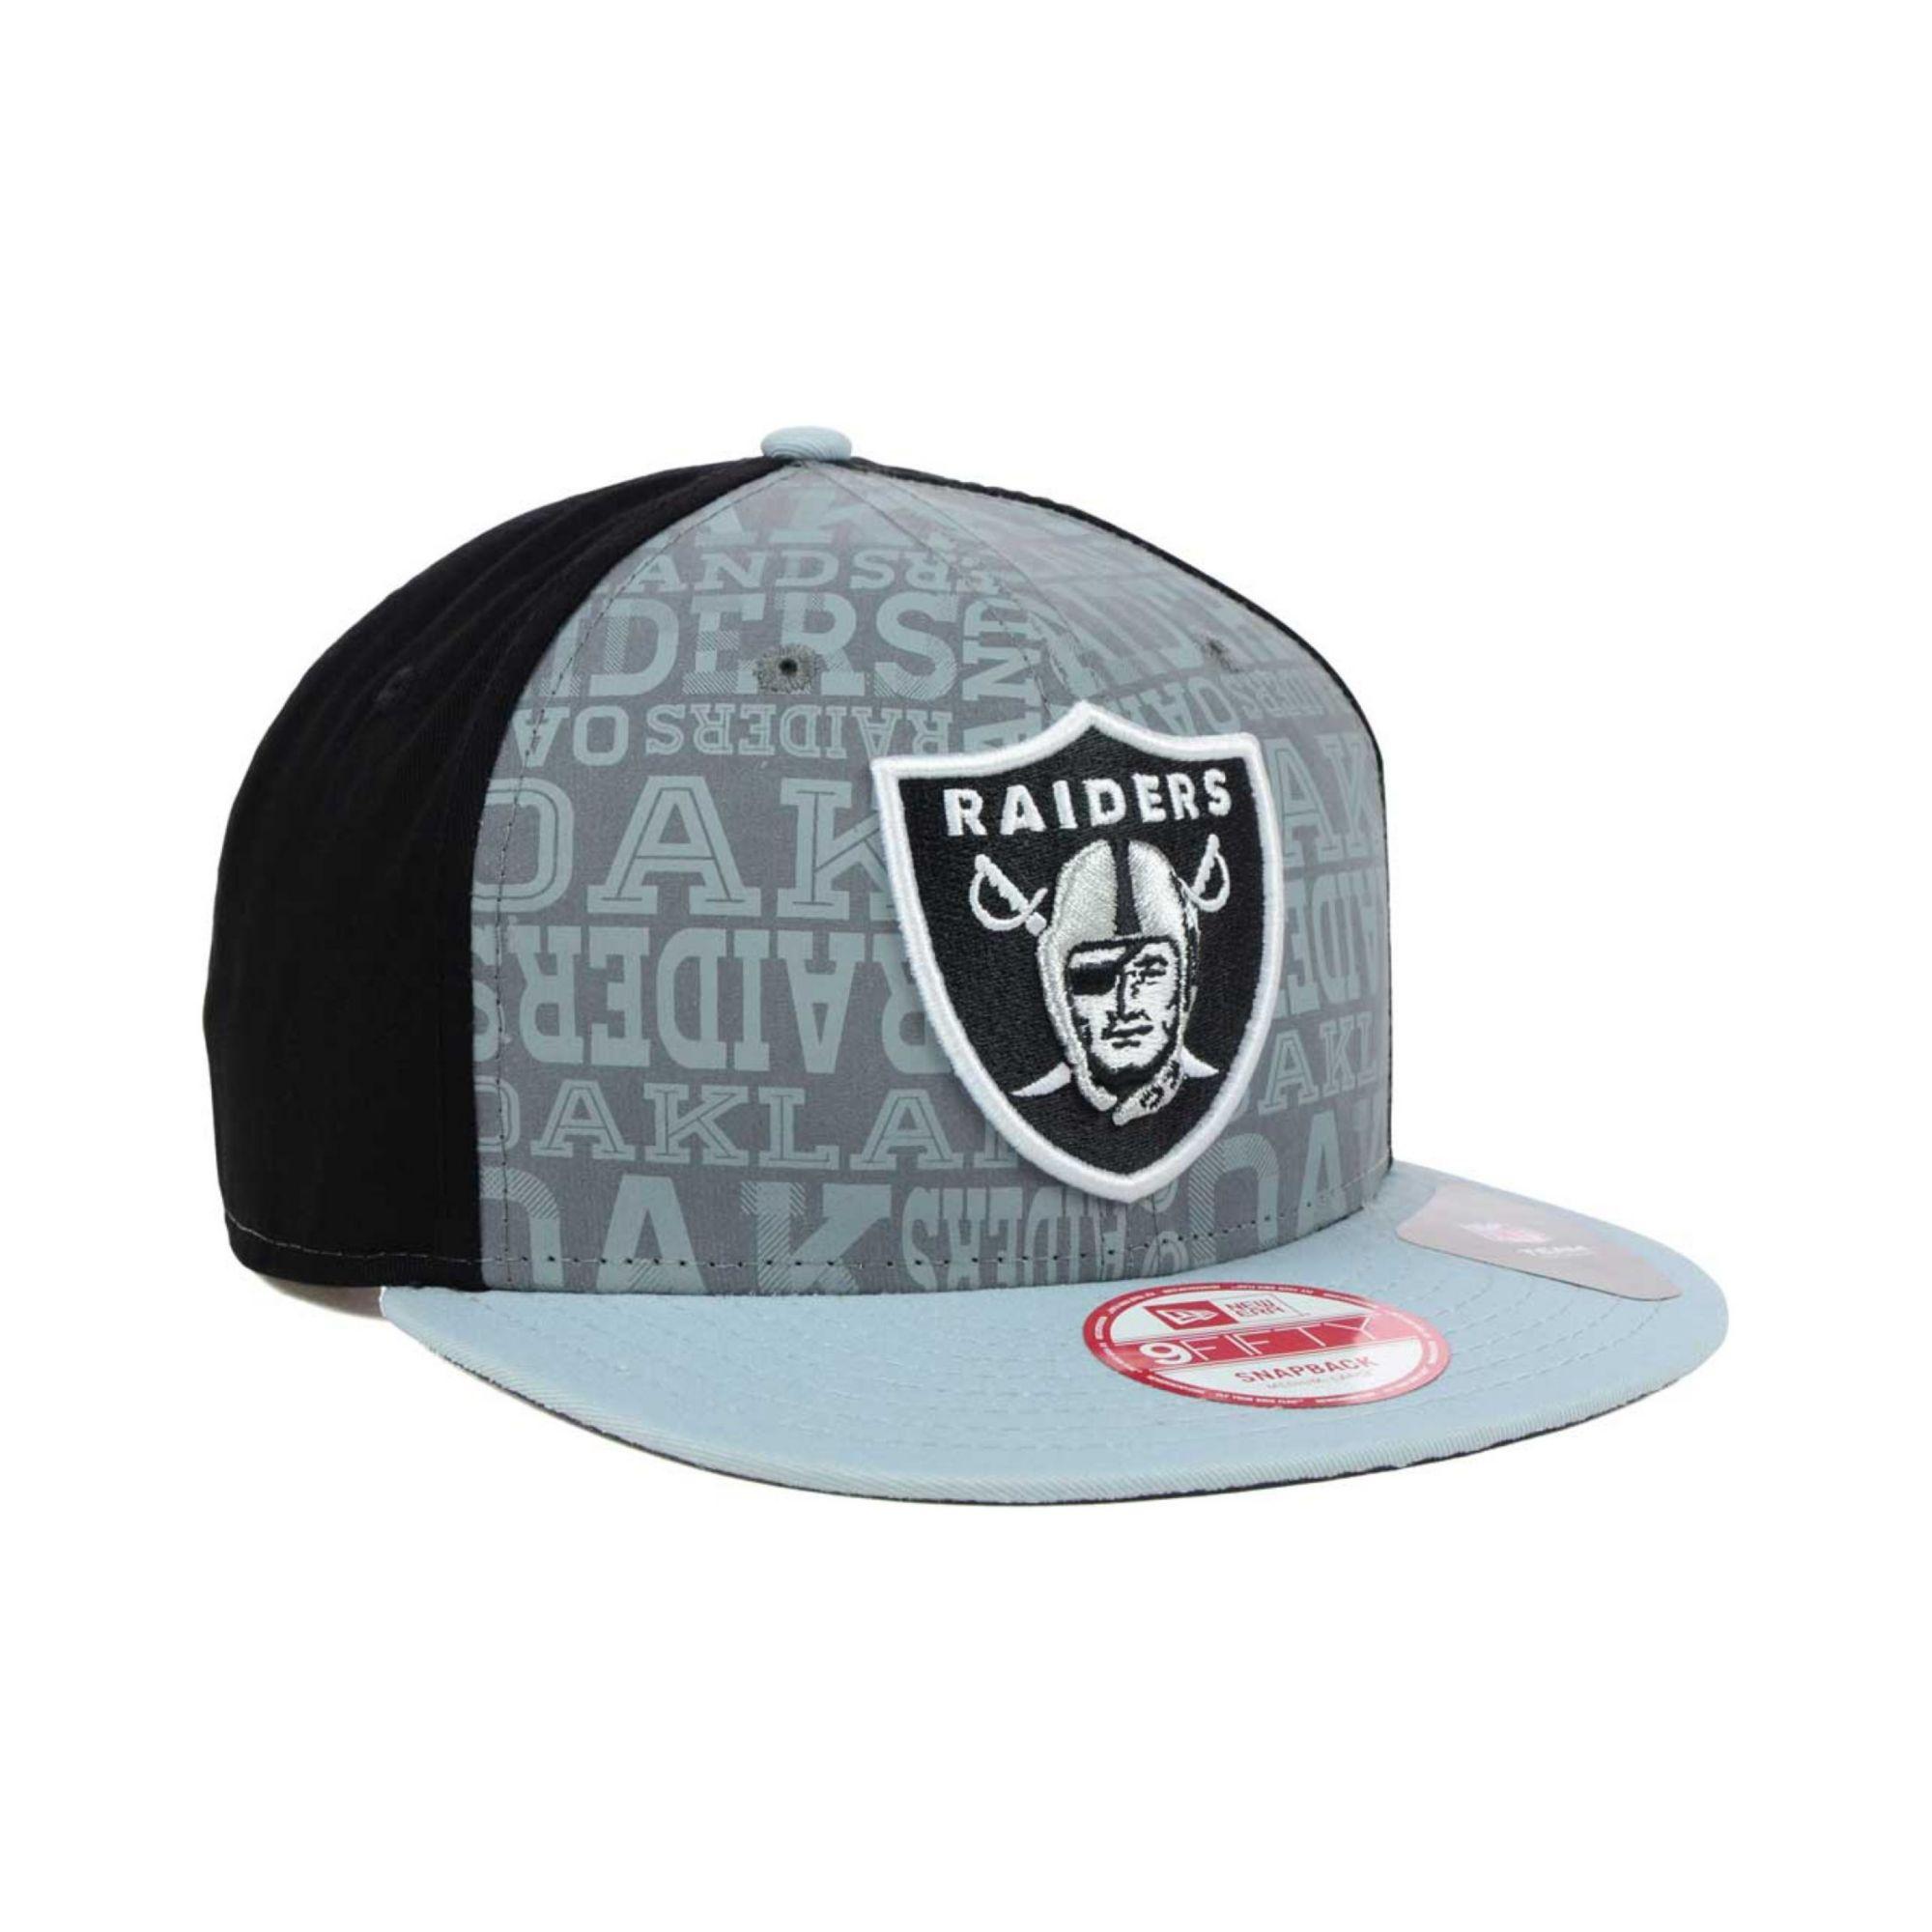 a8e7652e43b ... amazon lyst ktz oakland raiders nfl draft 9fifty snapback cap in black  3e9b6 43c4f ...